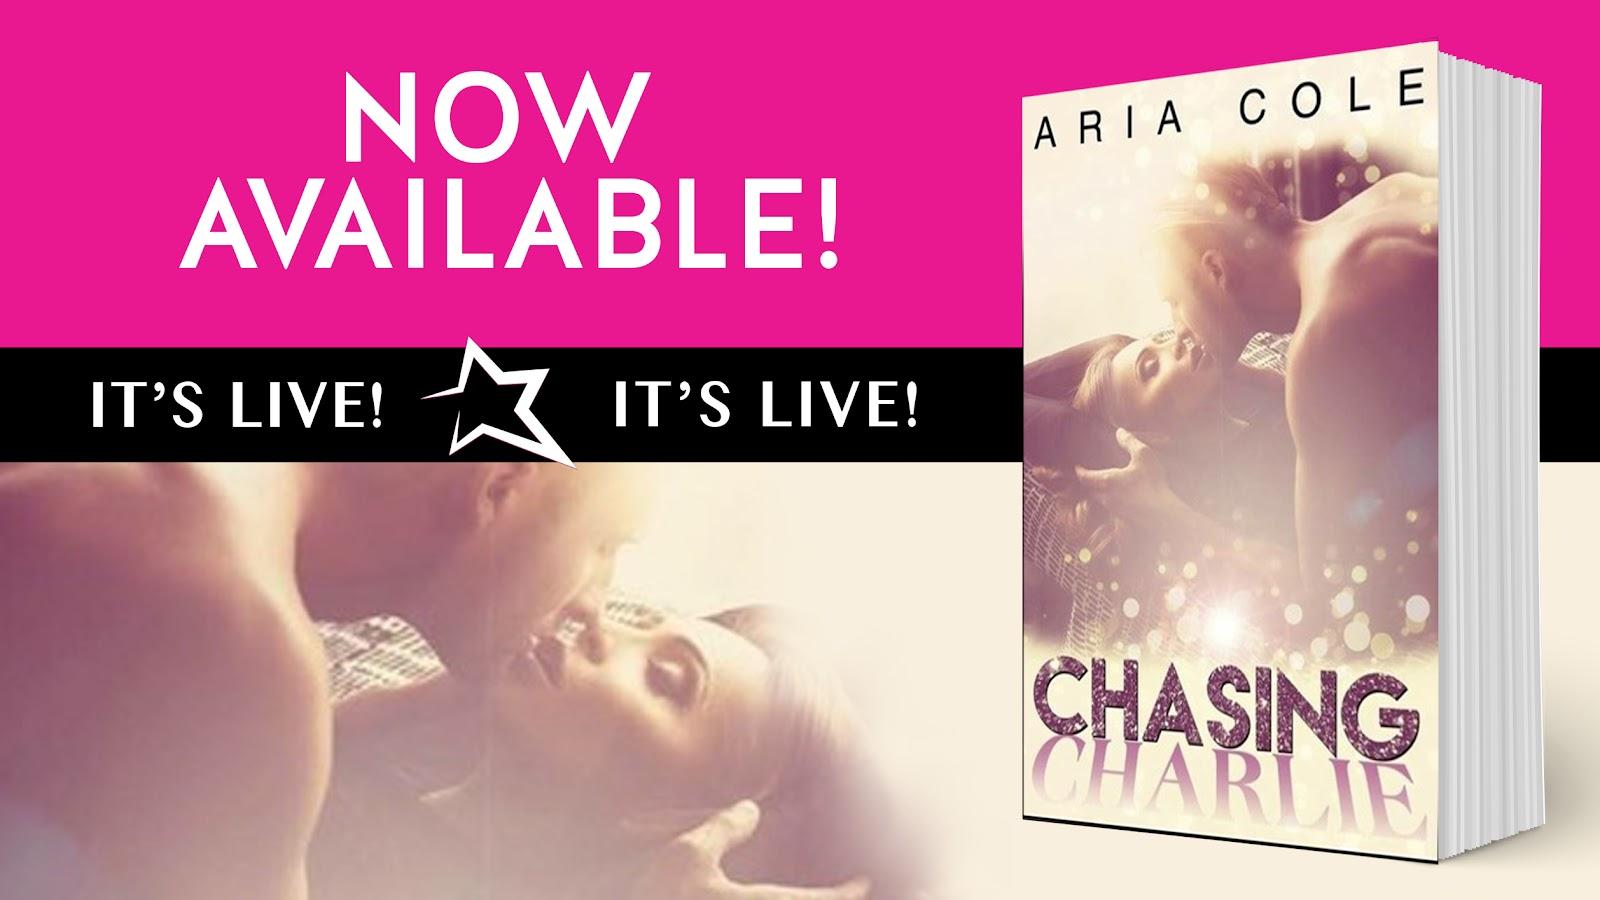 CHASING_CHARLIE_LIVE.jpg